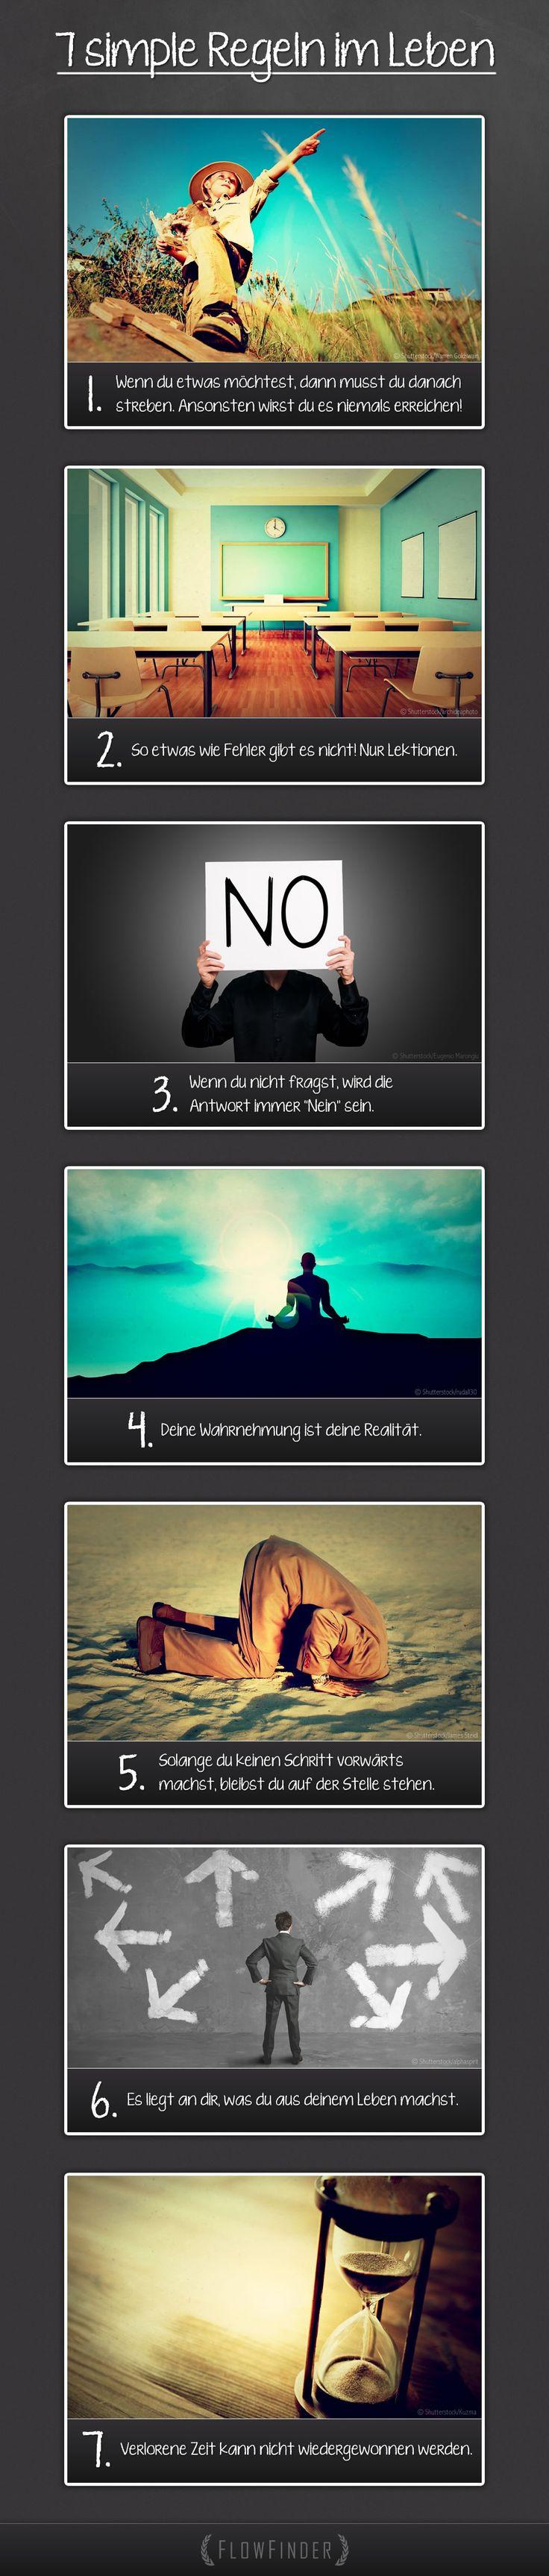 7 simple Regeln im Leben